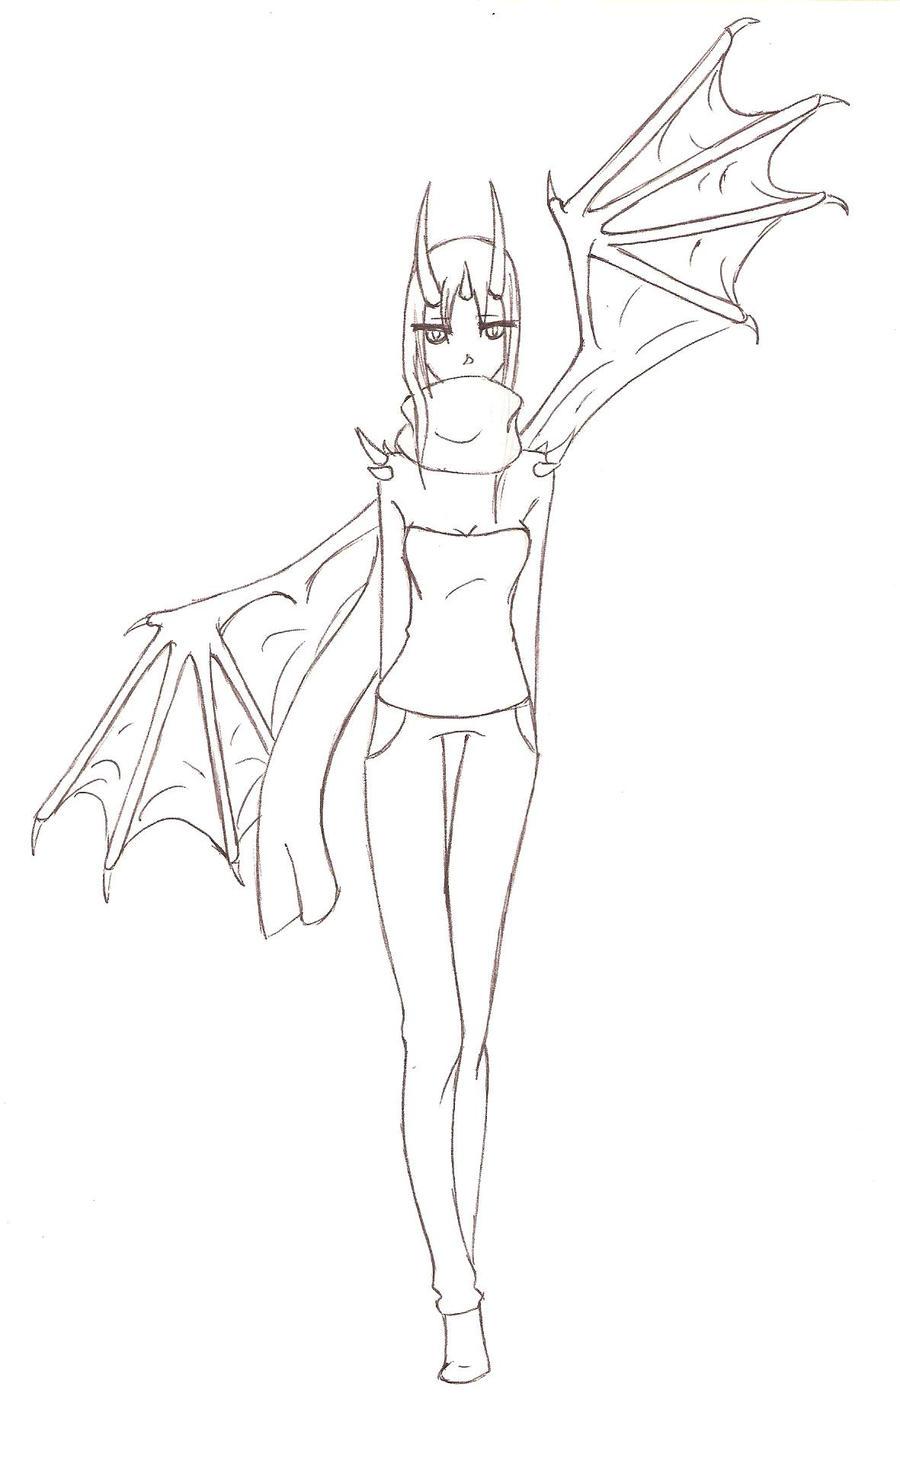 faery 2 by jenna-aw